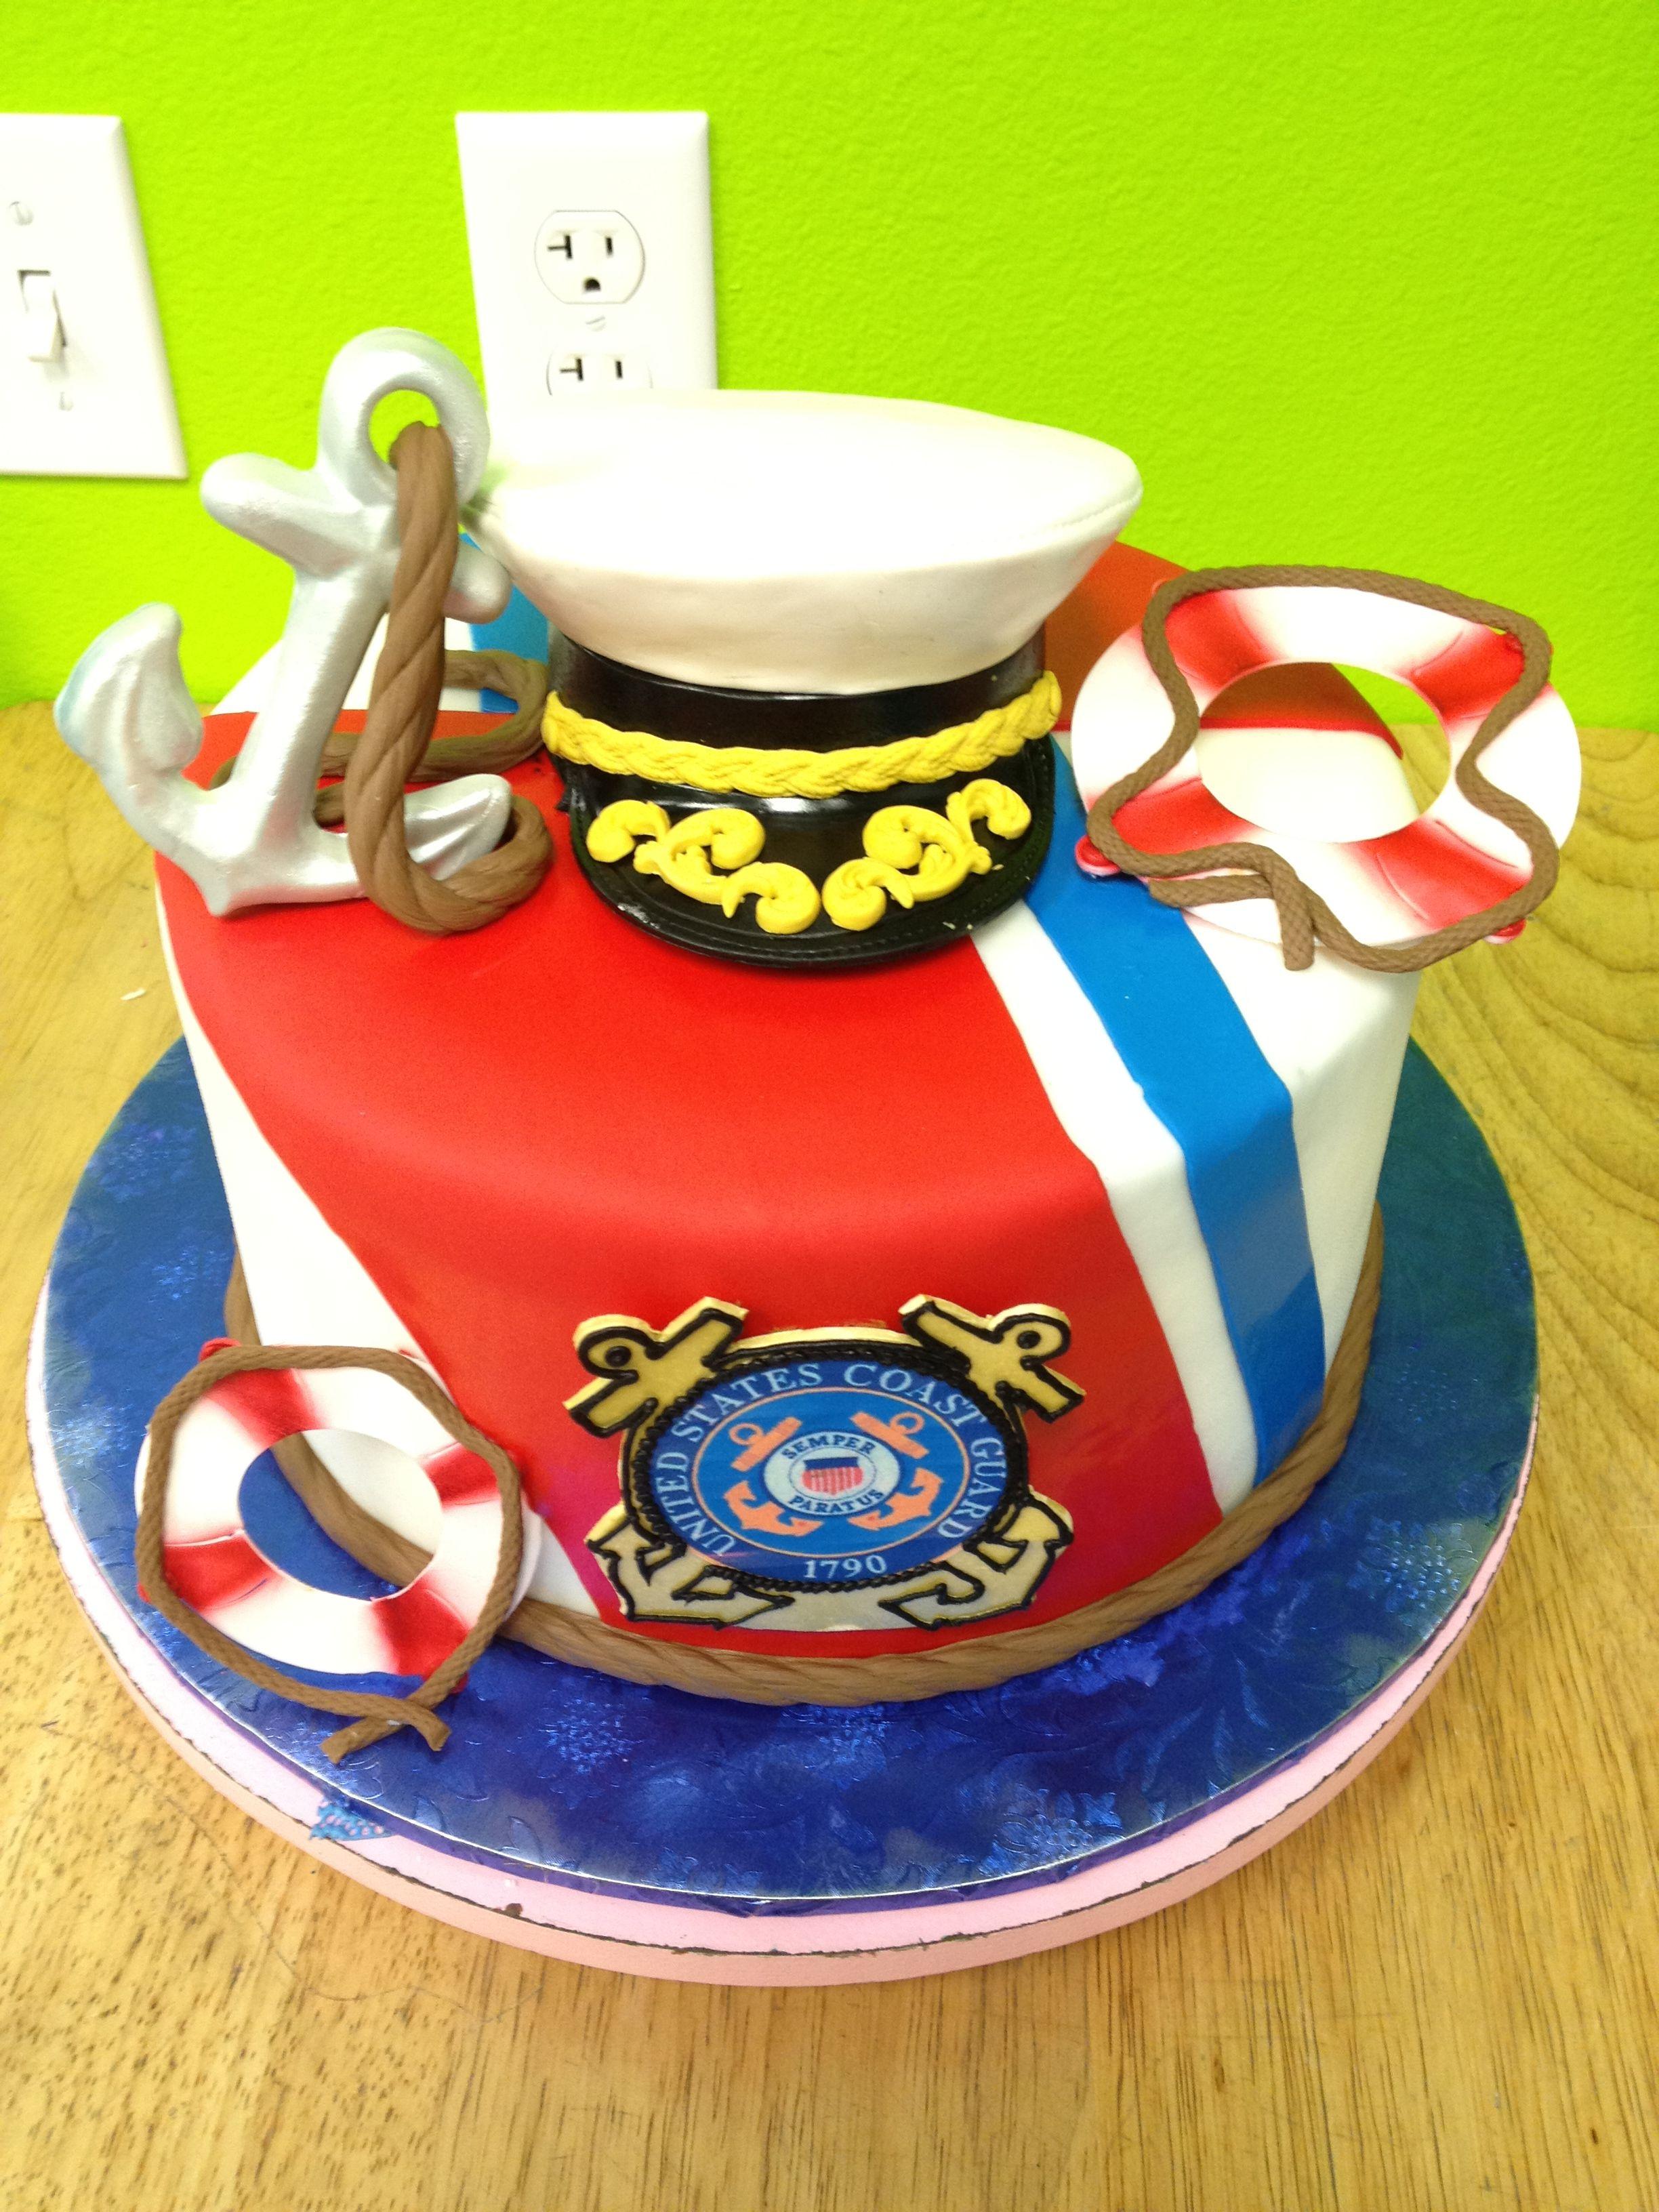 53caff31296 coast guard cake.  hollywoodsrealheros